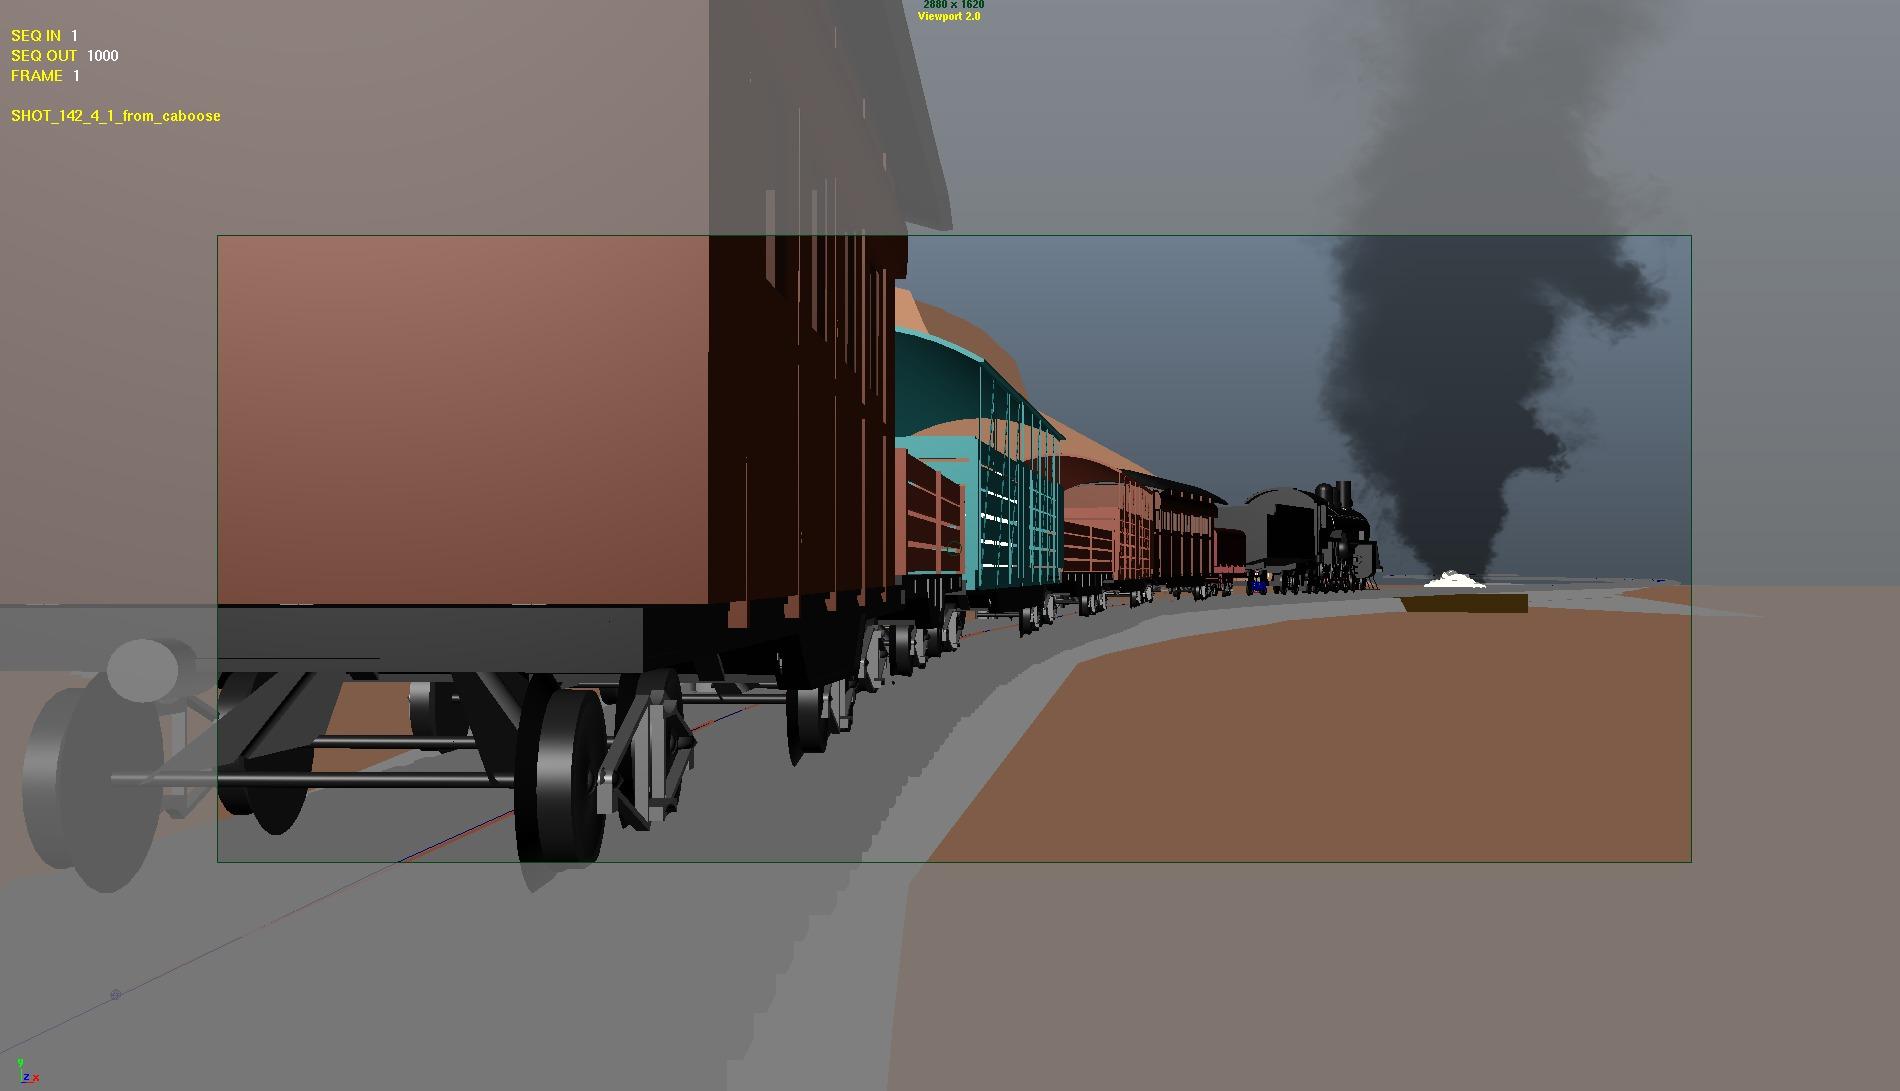 trainseq-7.jpg